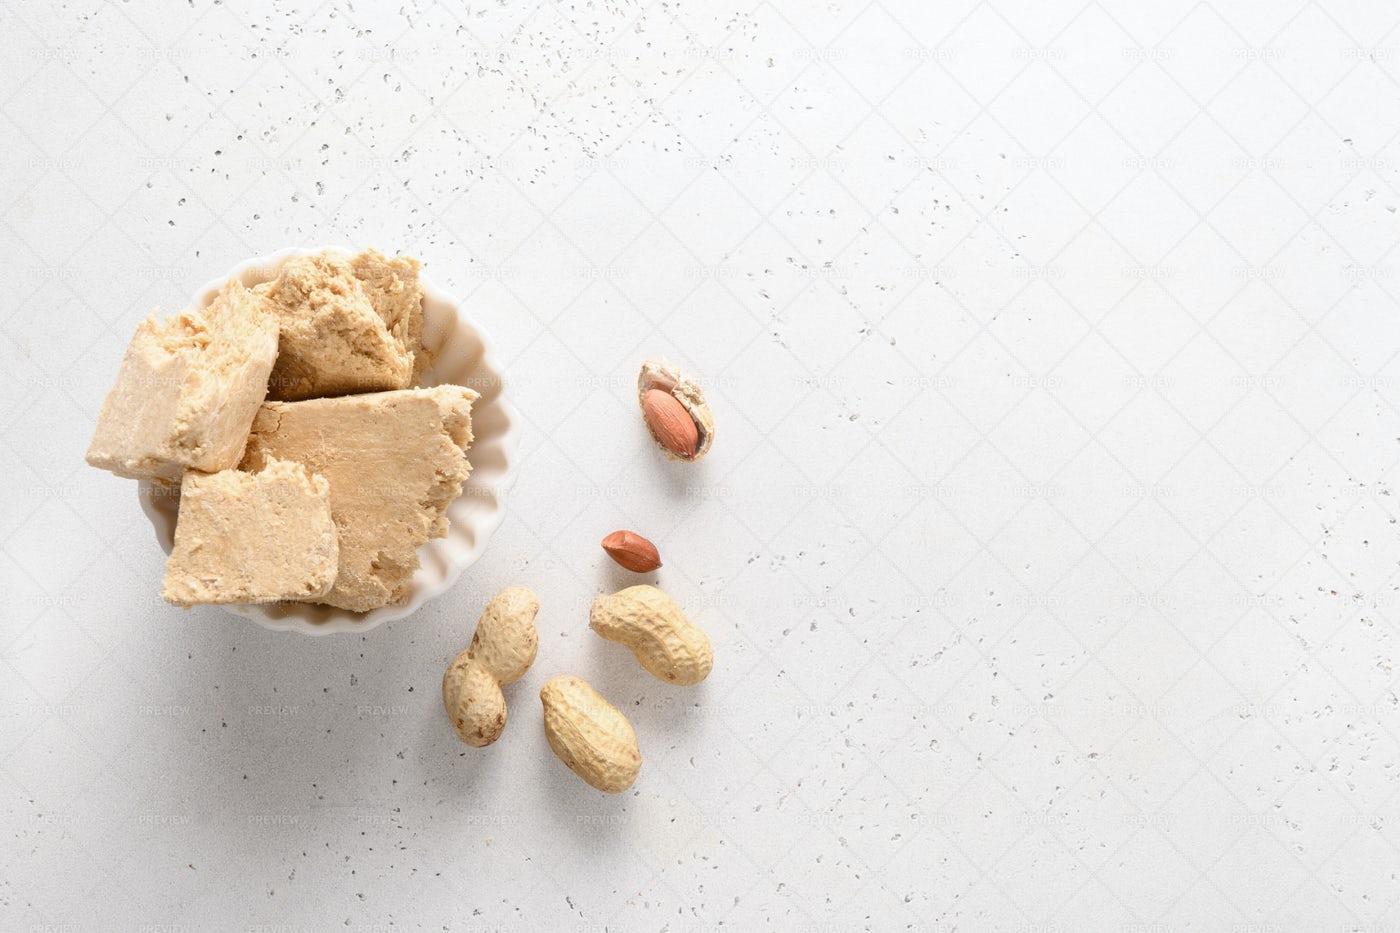 Sweet Dessert Peanuts Halva: Stock Photos